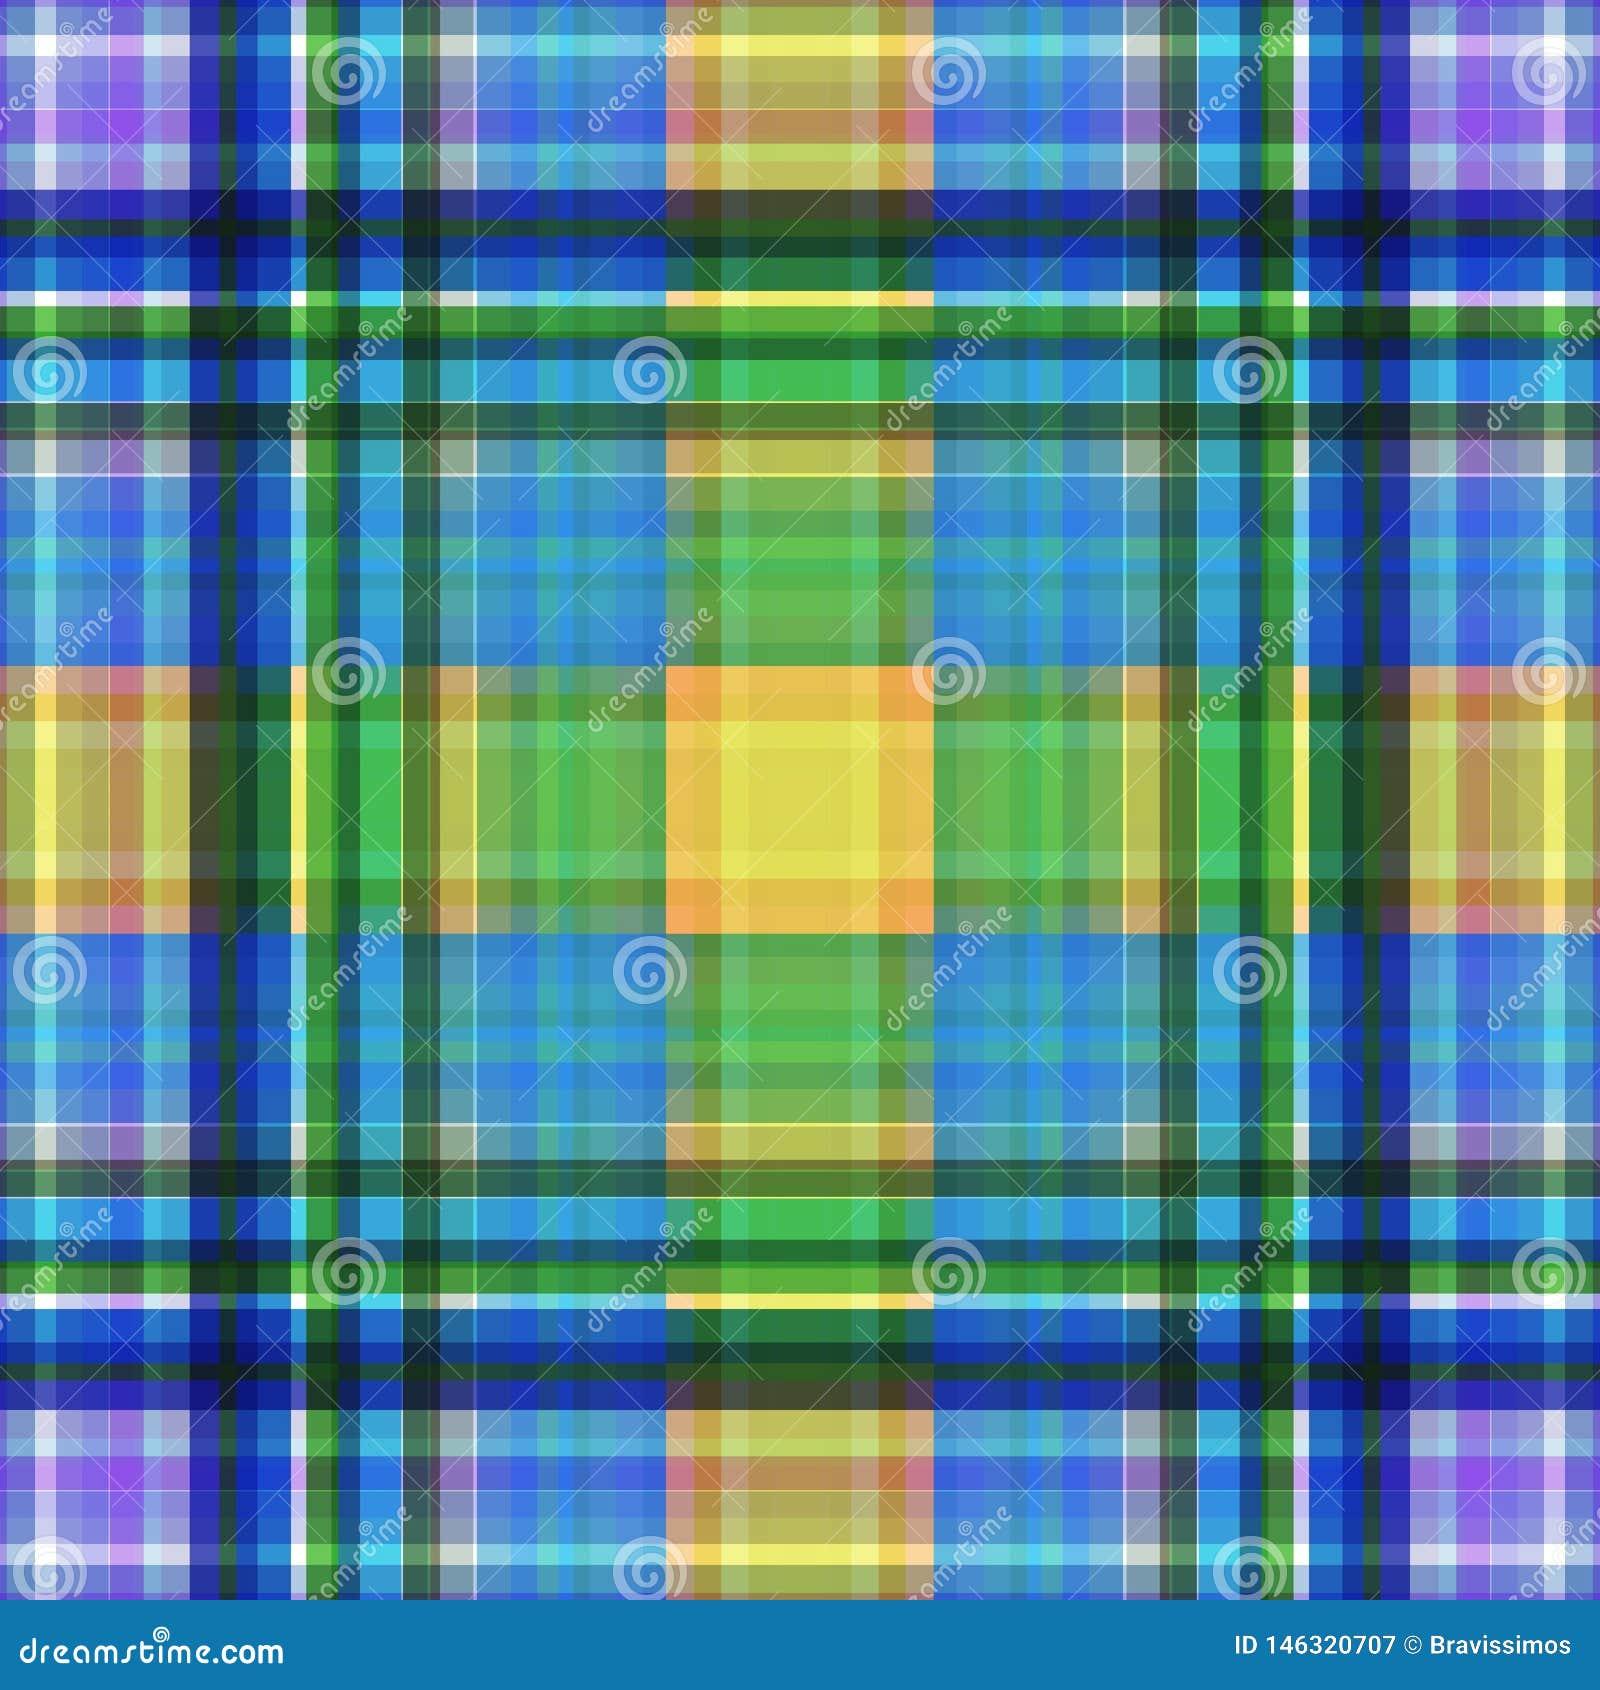 Square hypnotic pattern, illusion geometric. graphic tile